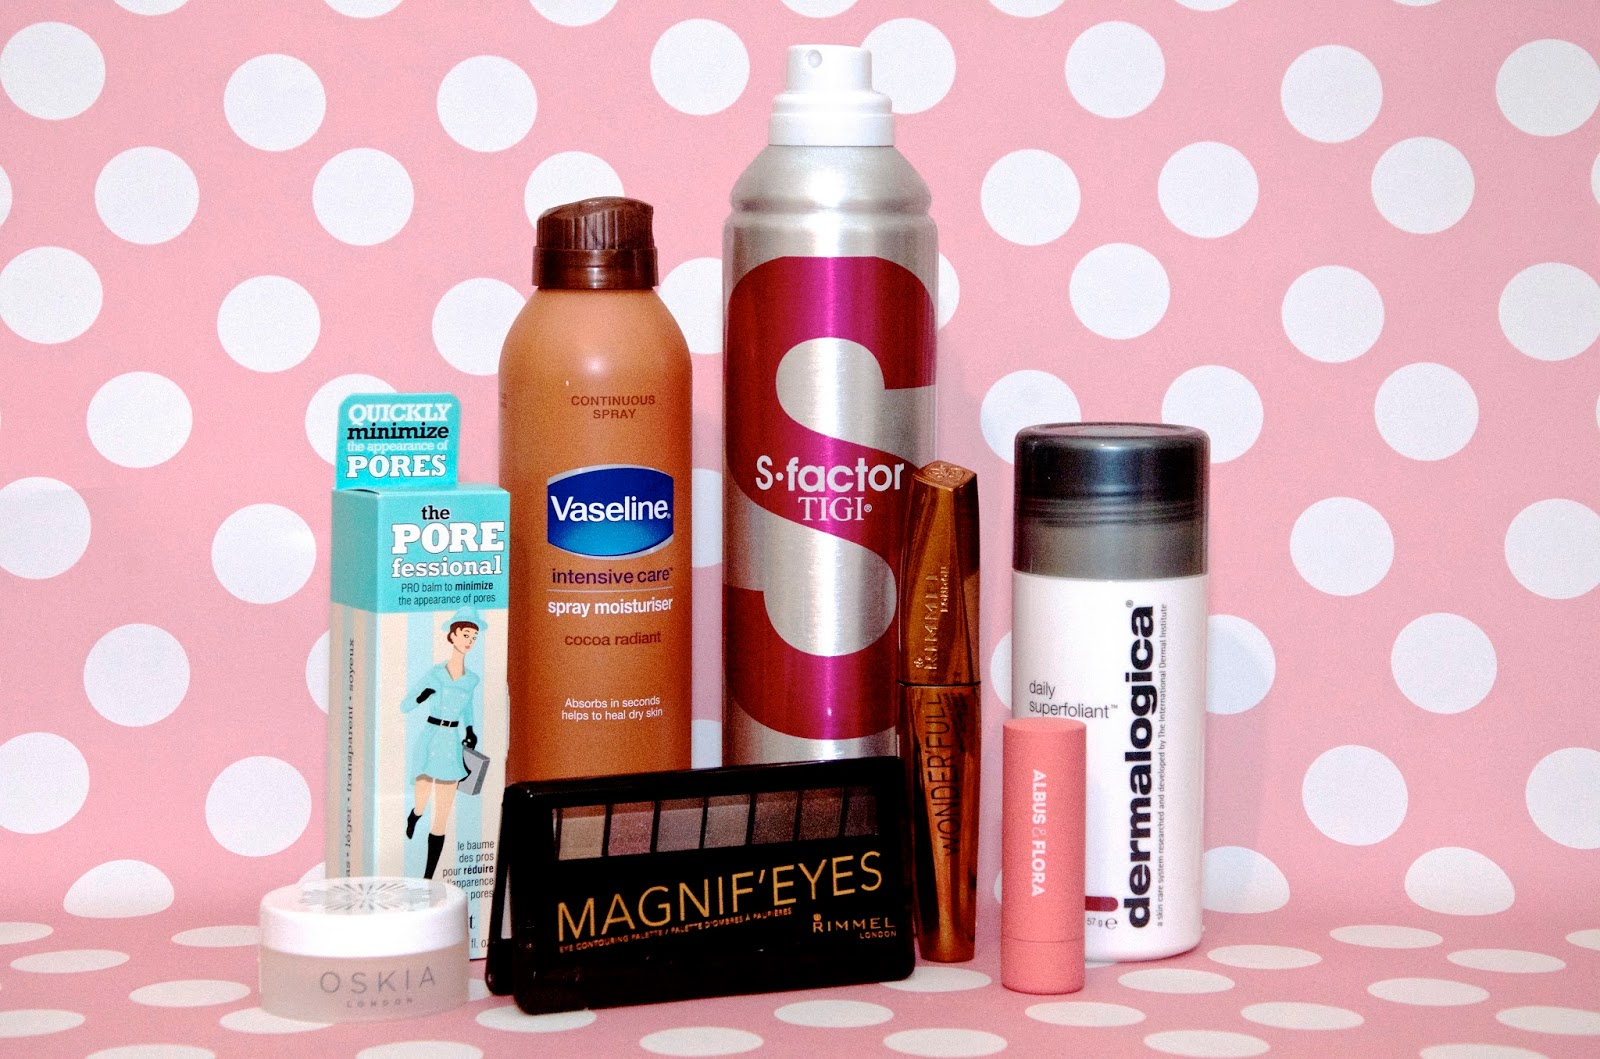 lipstick, hairspray, skincare and makeup